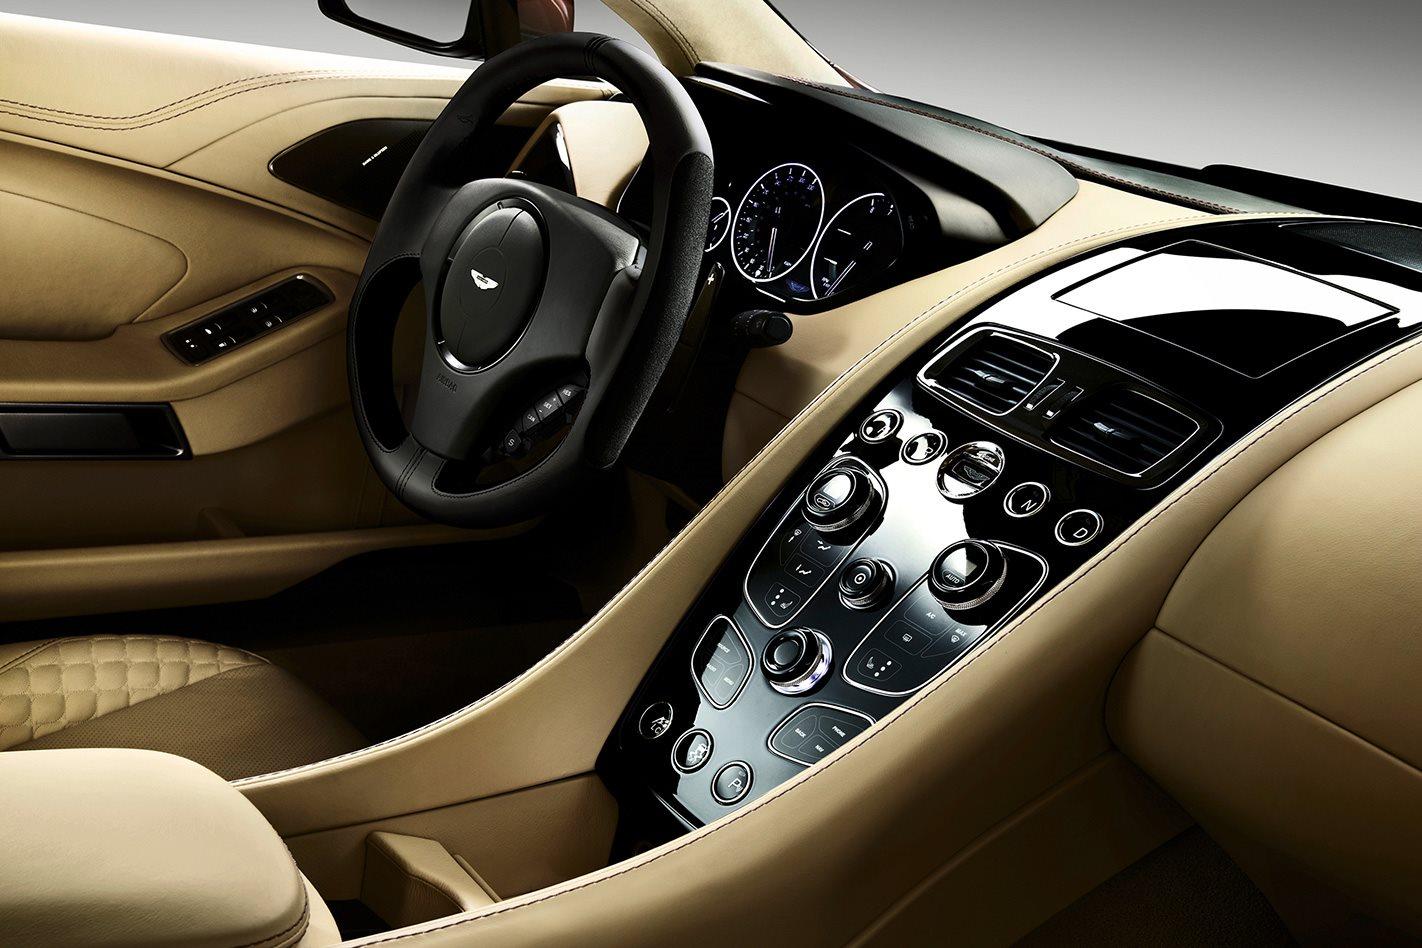 2012-Aston-Martin-Vanquish-interior.jpg